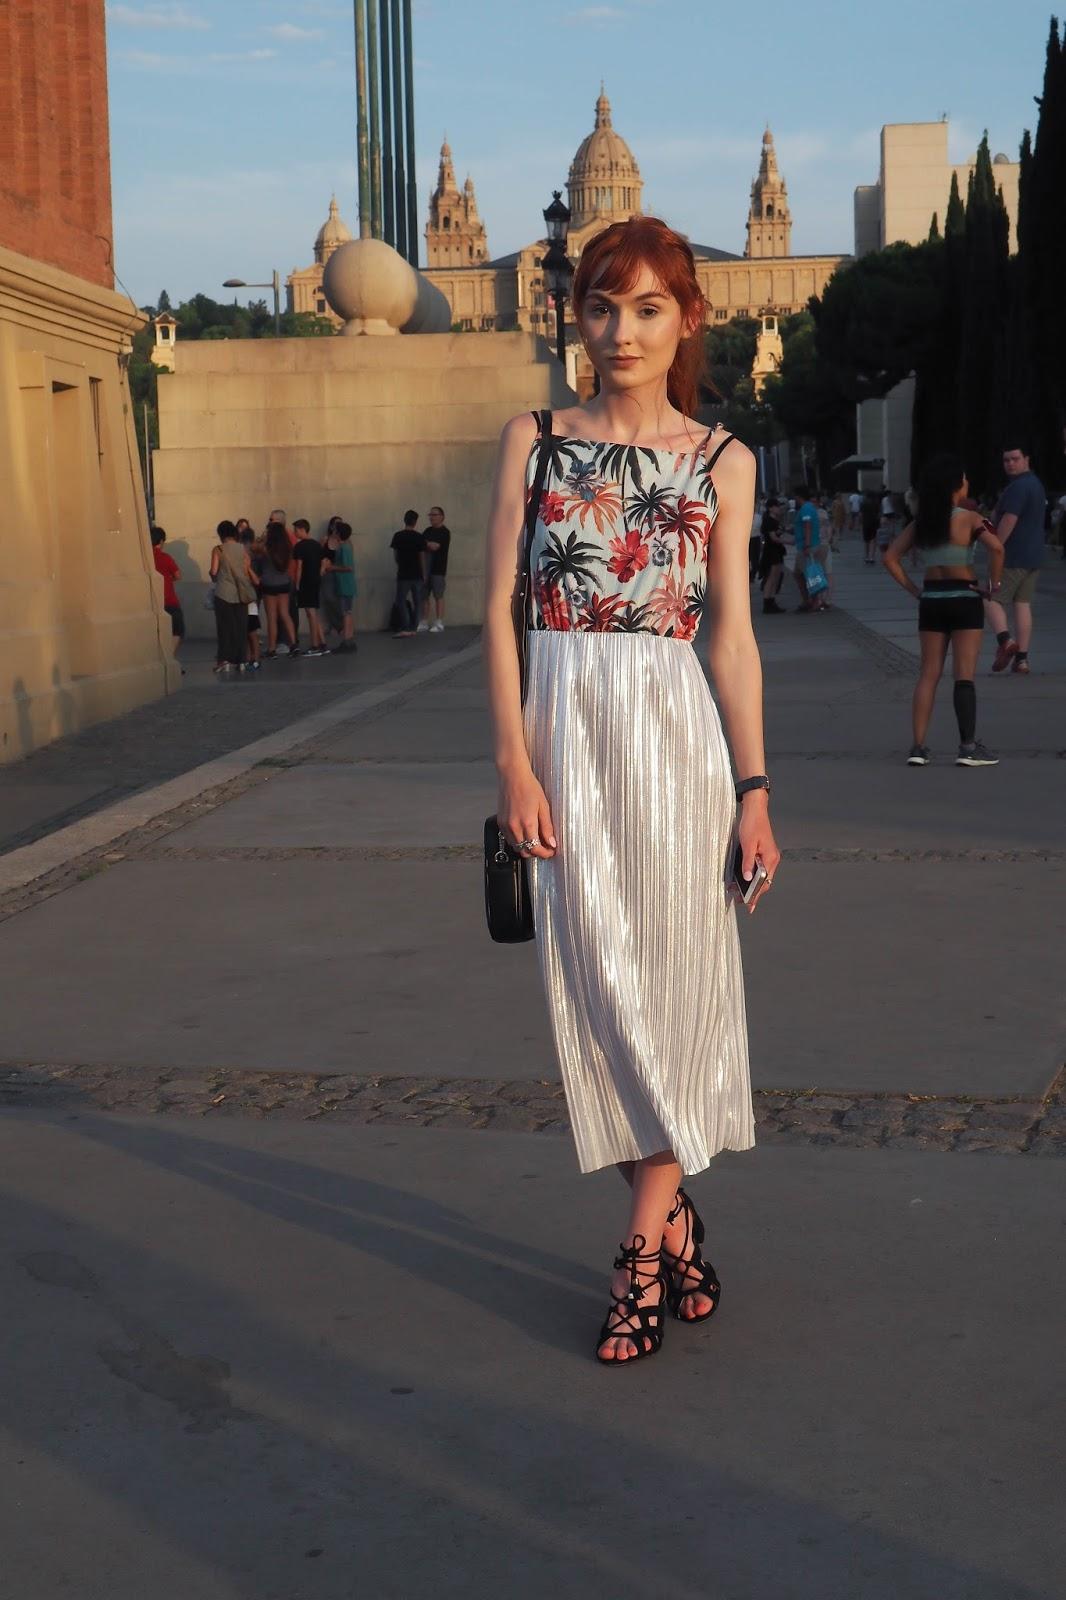 b530d4f99 Barcelona Evening Wear Lookbook   Salt and Chic